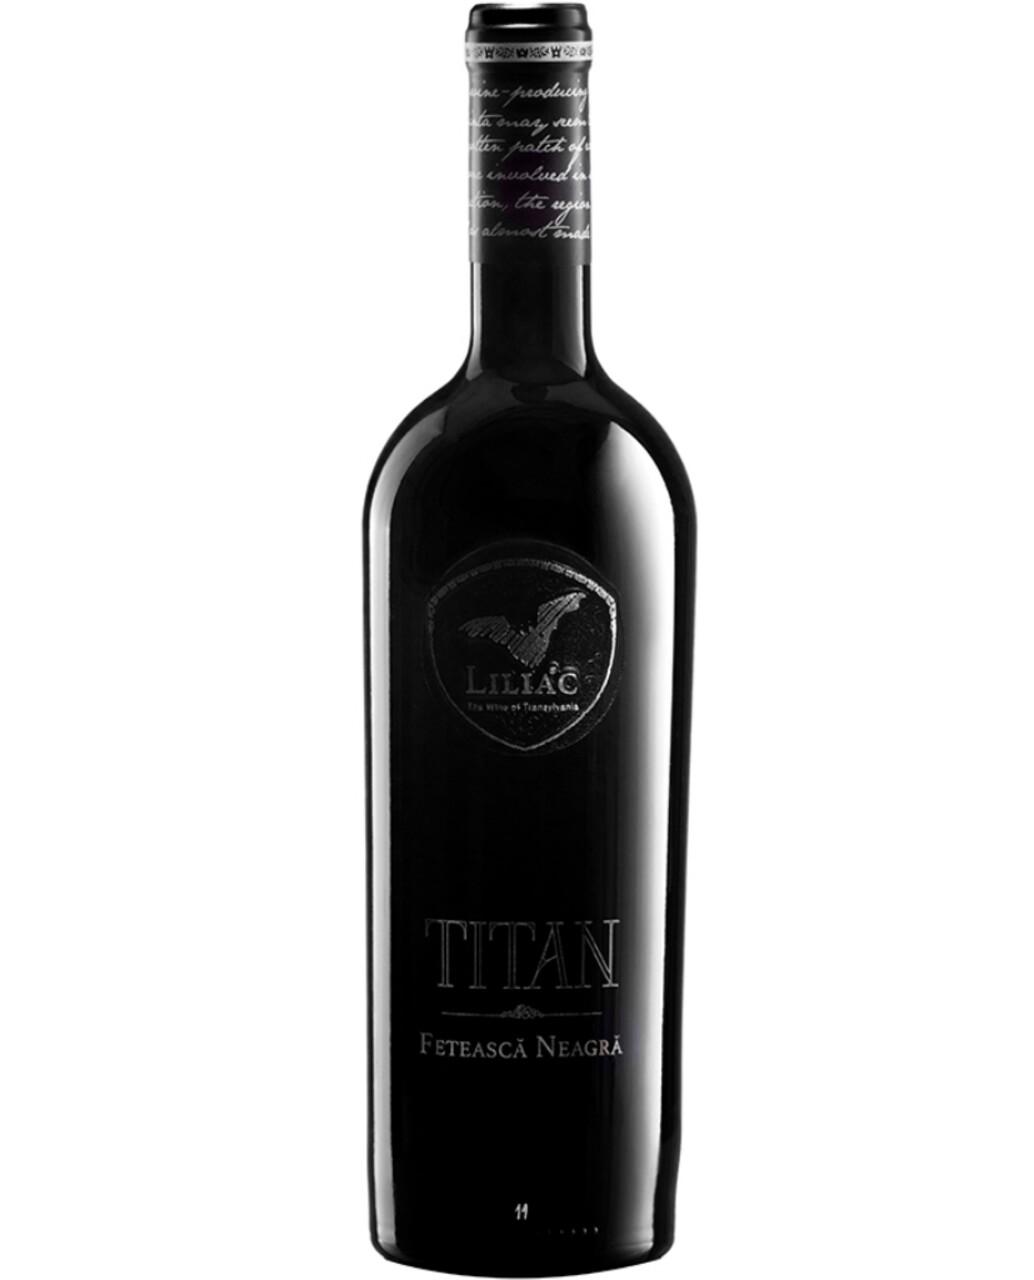 Liliac Titan Feteasca Neagra